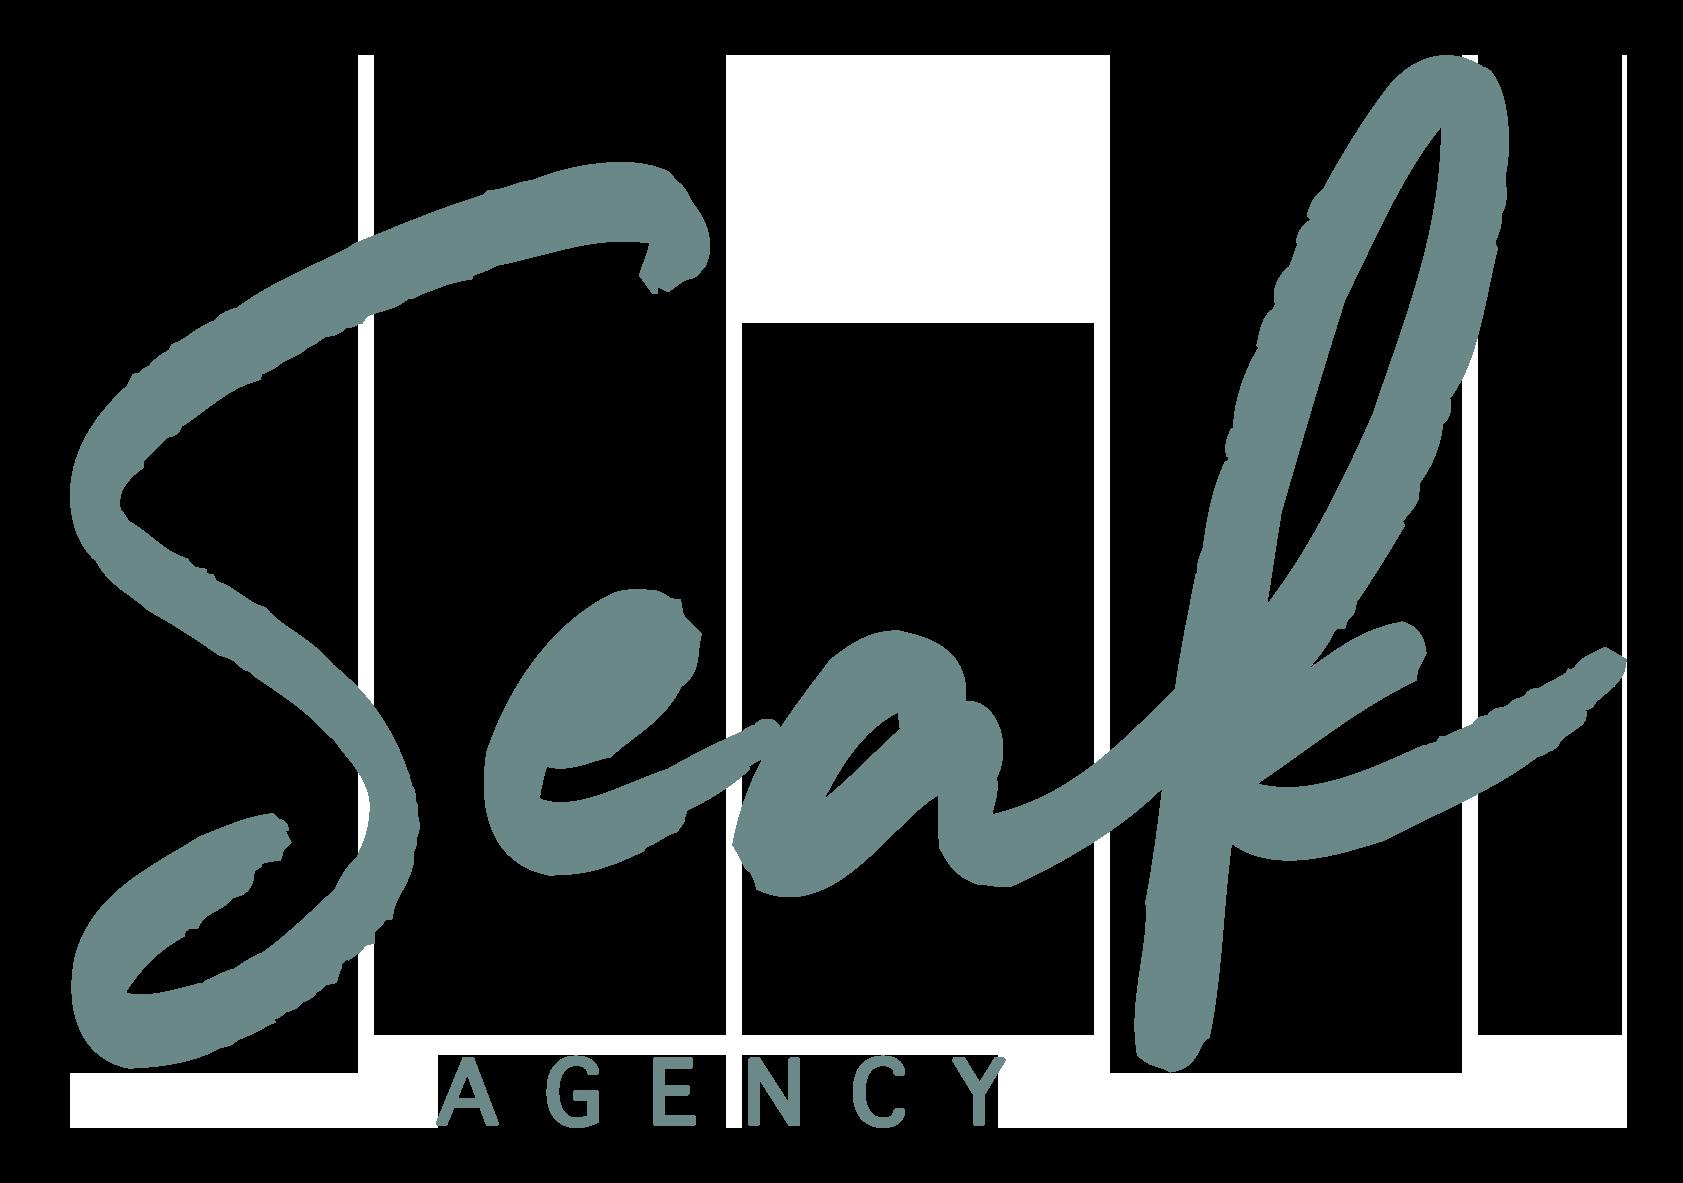 Seak Agency